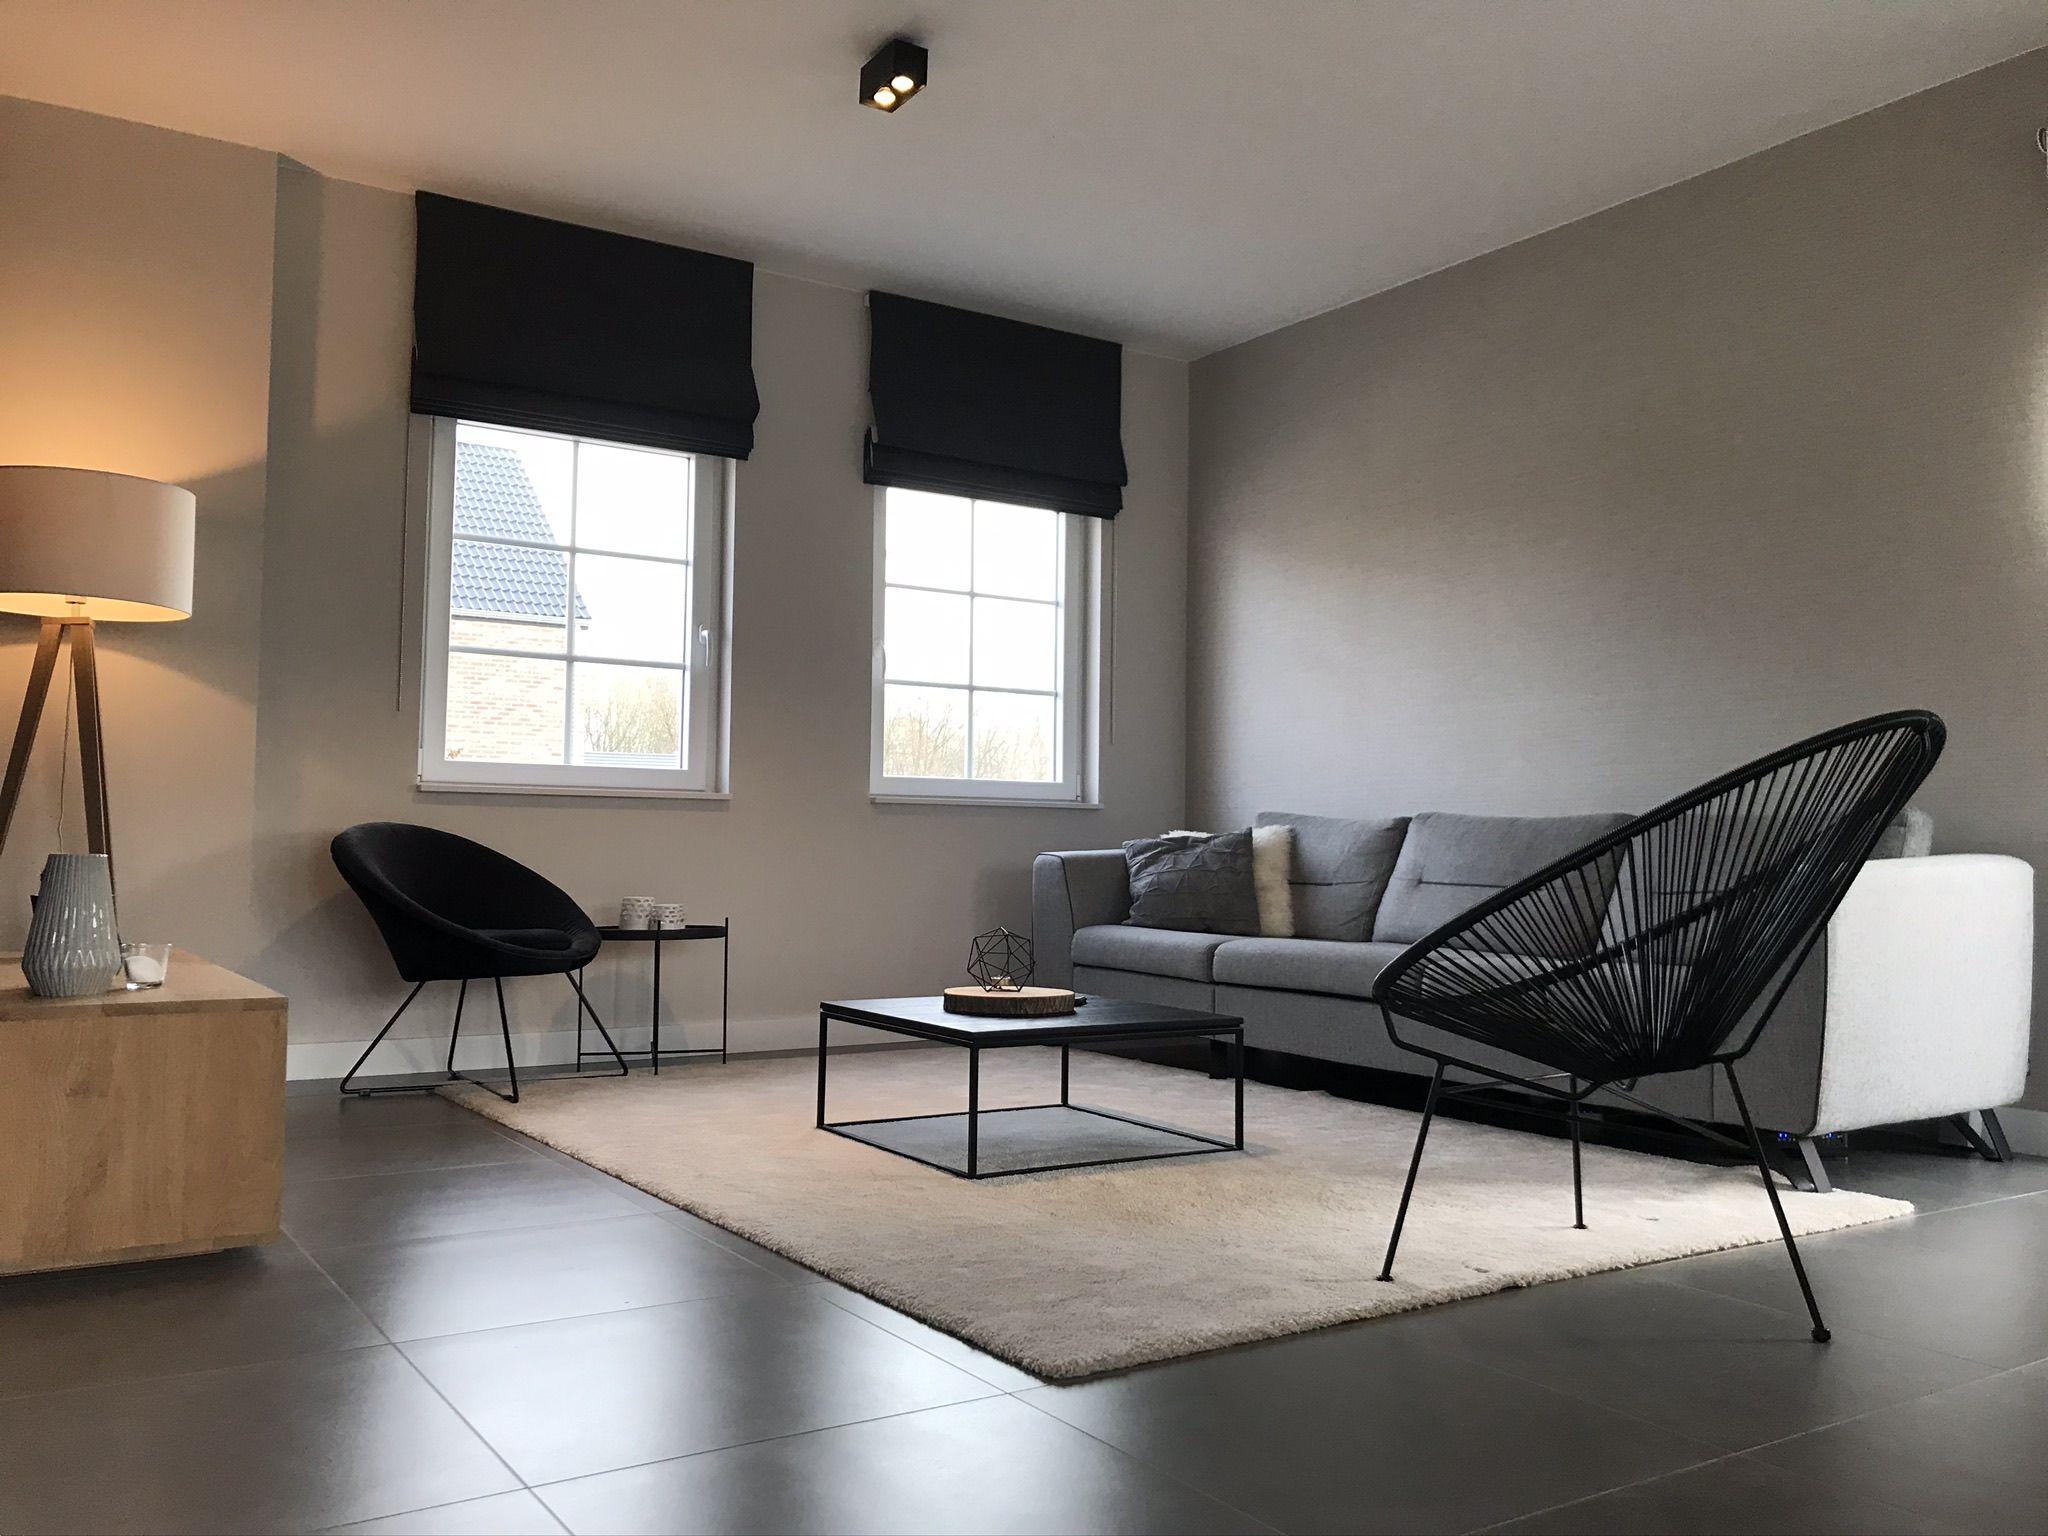 Marie S Home Agence De Decoration D Interieur Namur Belgique Met Afbeeldingen